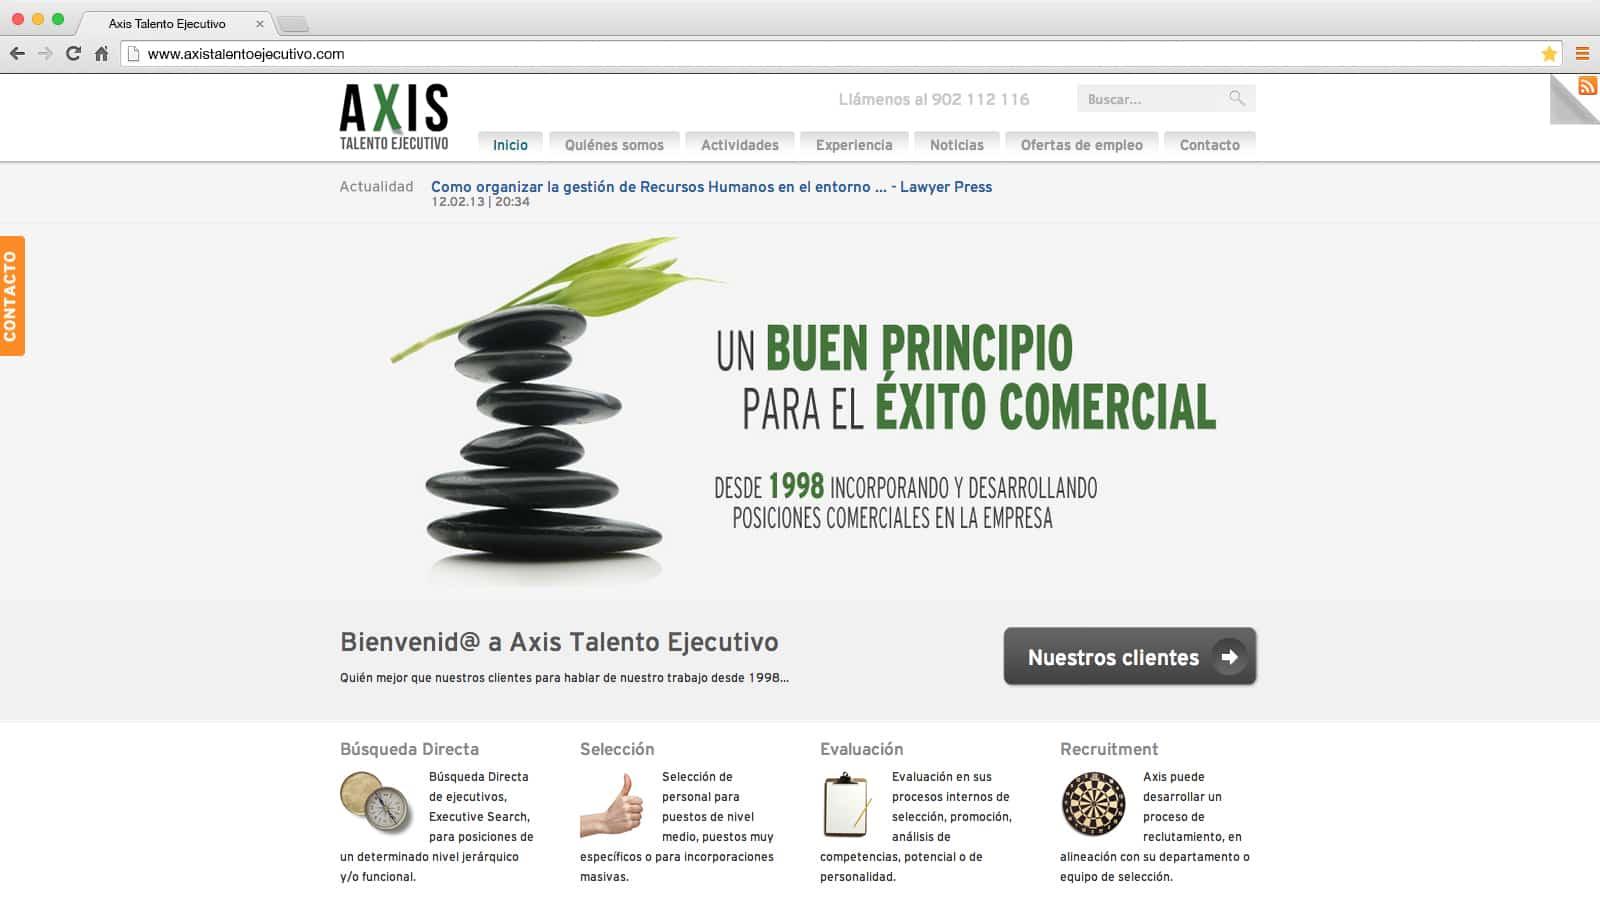 Axis Talento Ejecutivo: web